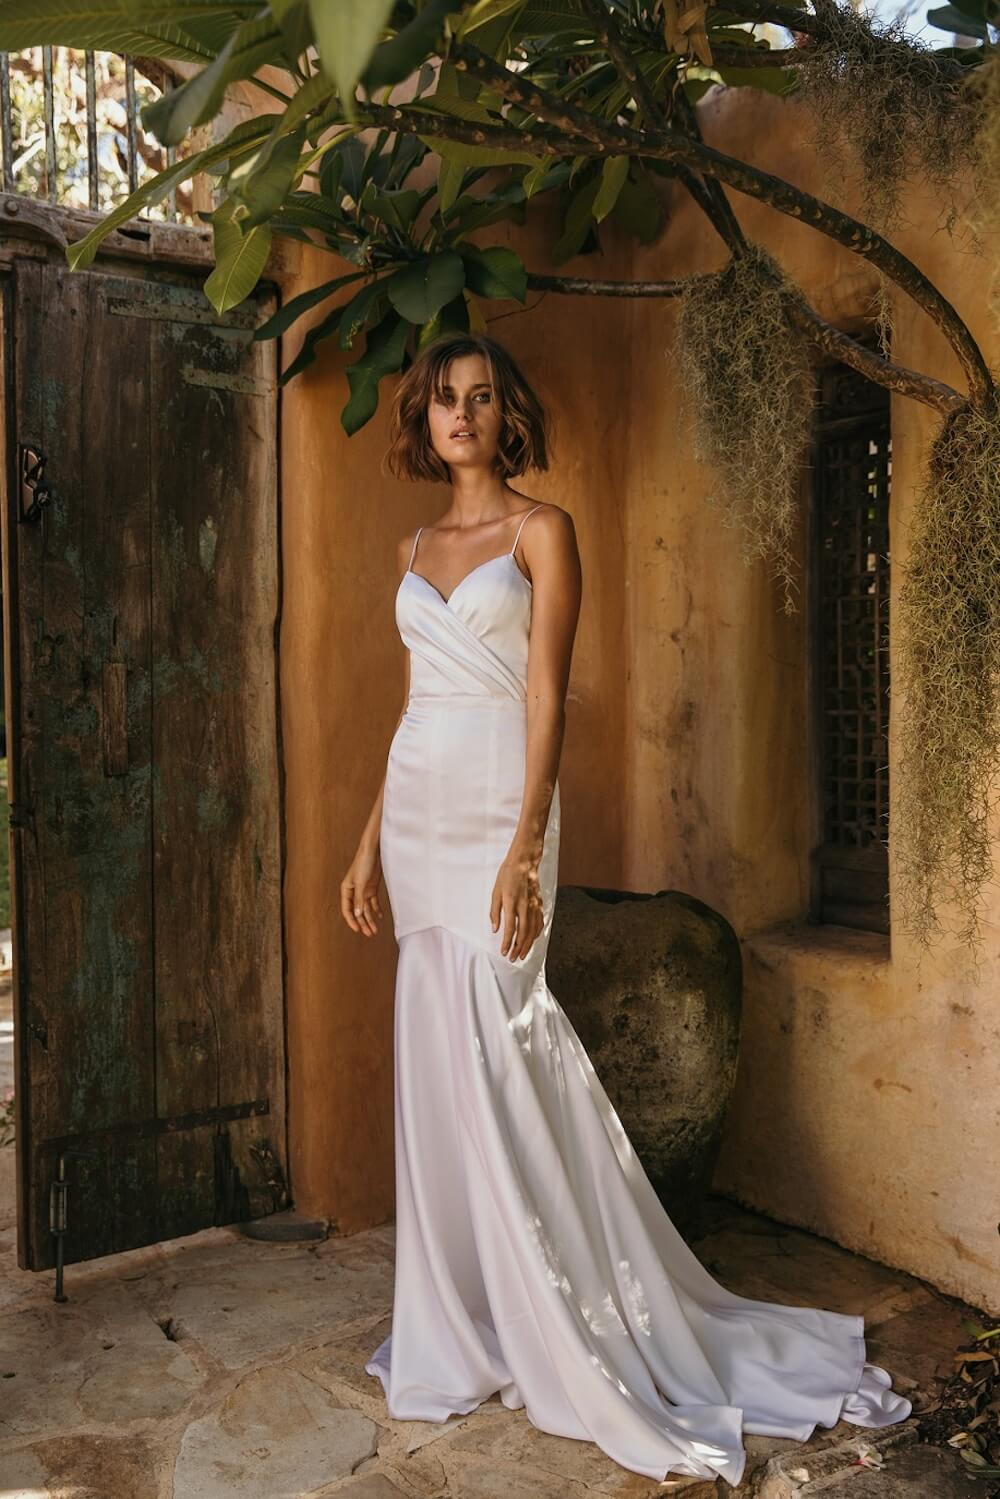 Wanderlust wedding dress by Jennifer Go Bridal featured on LOVE FIND CO.